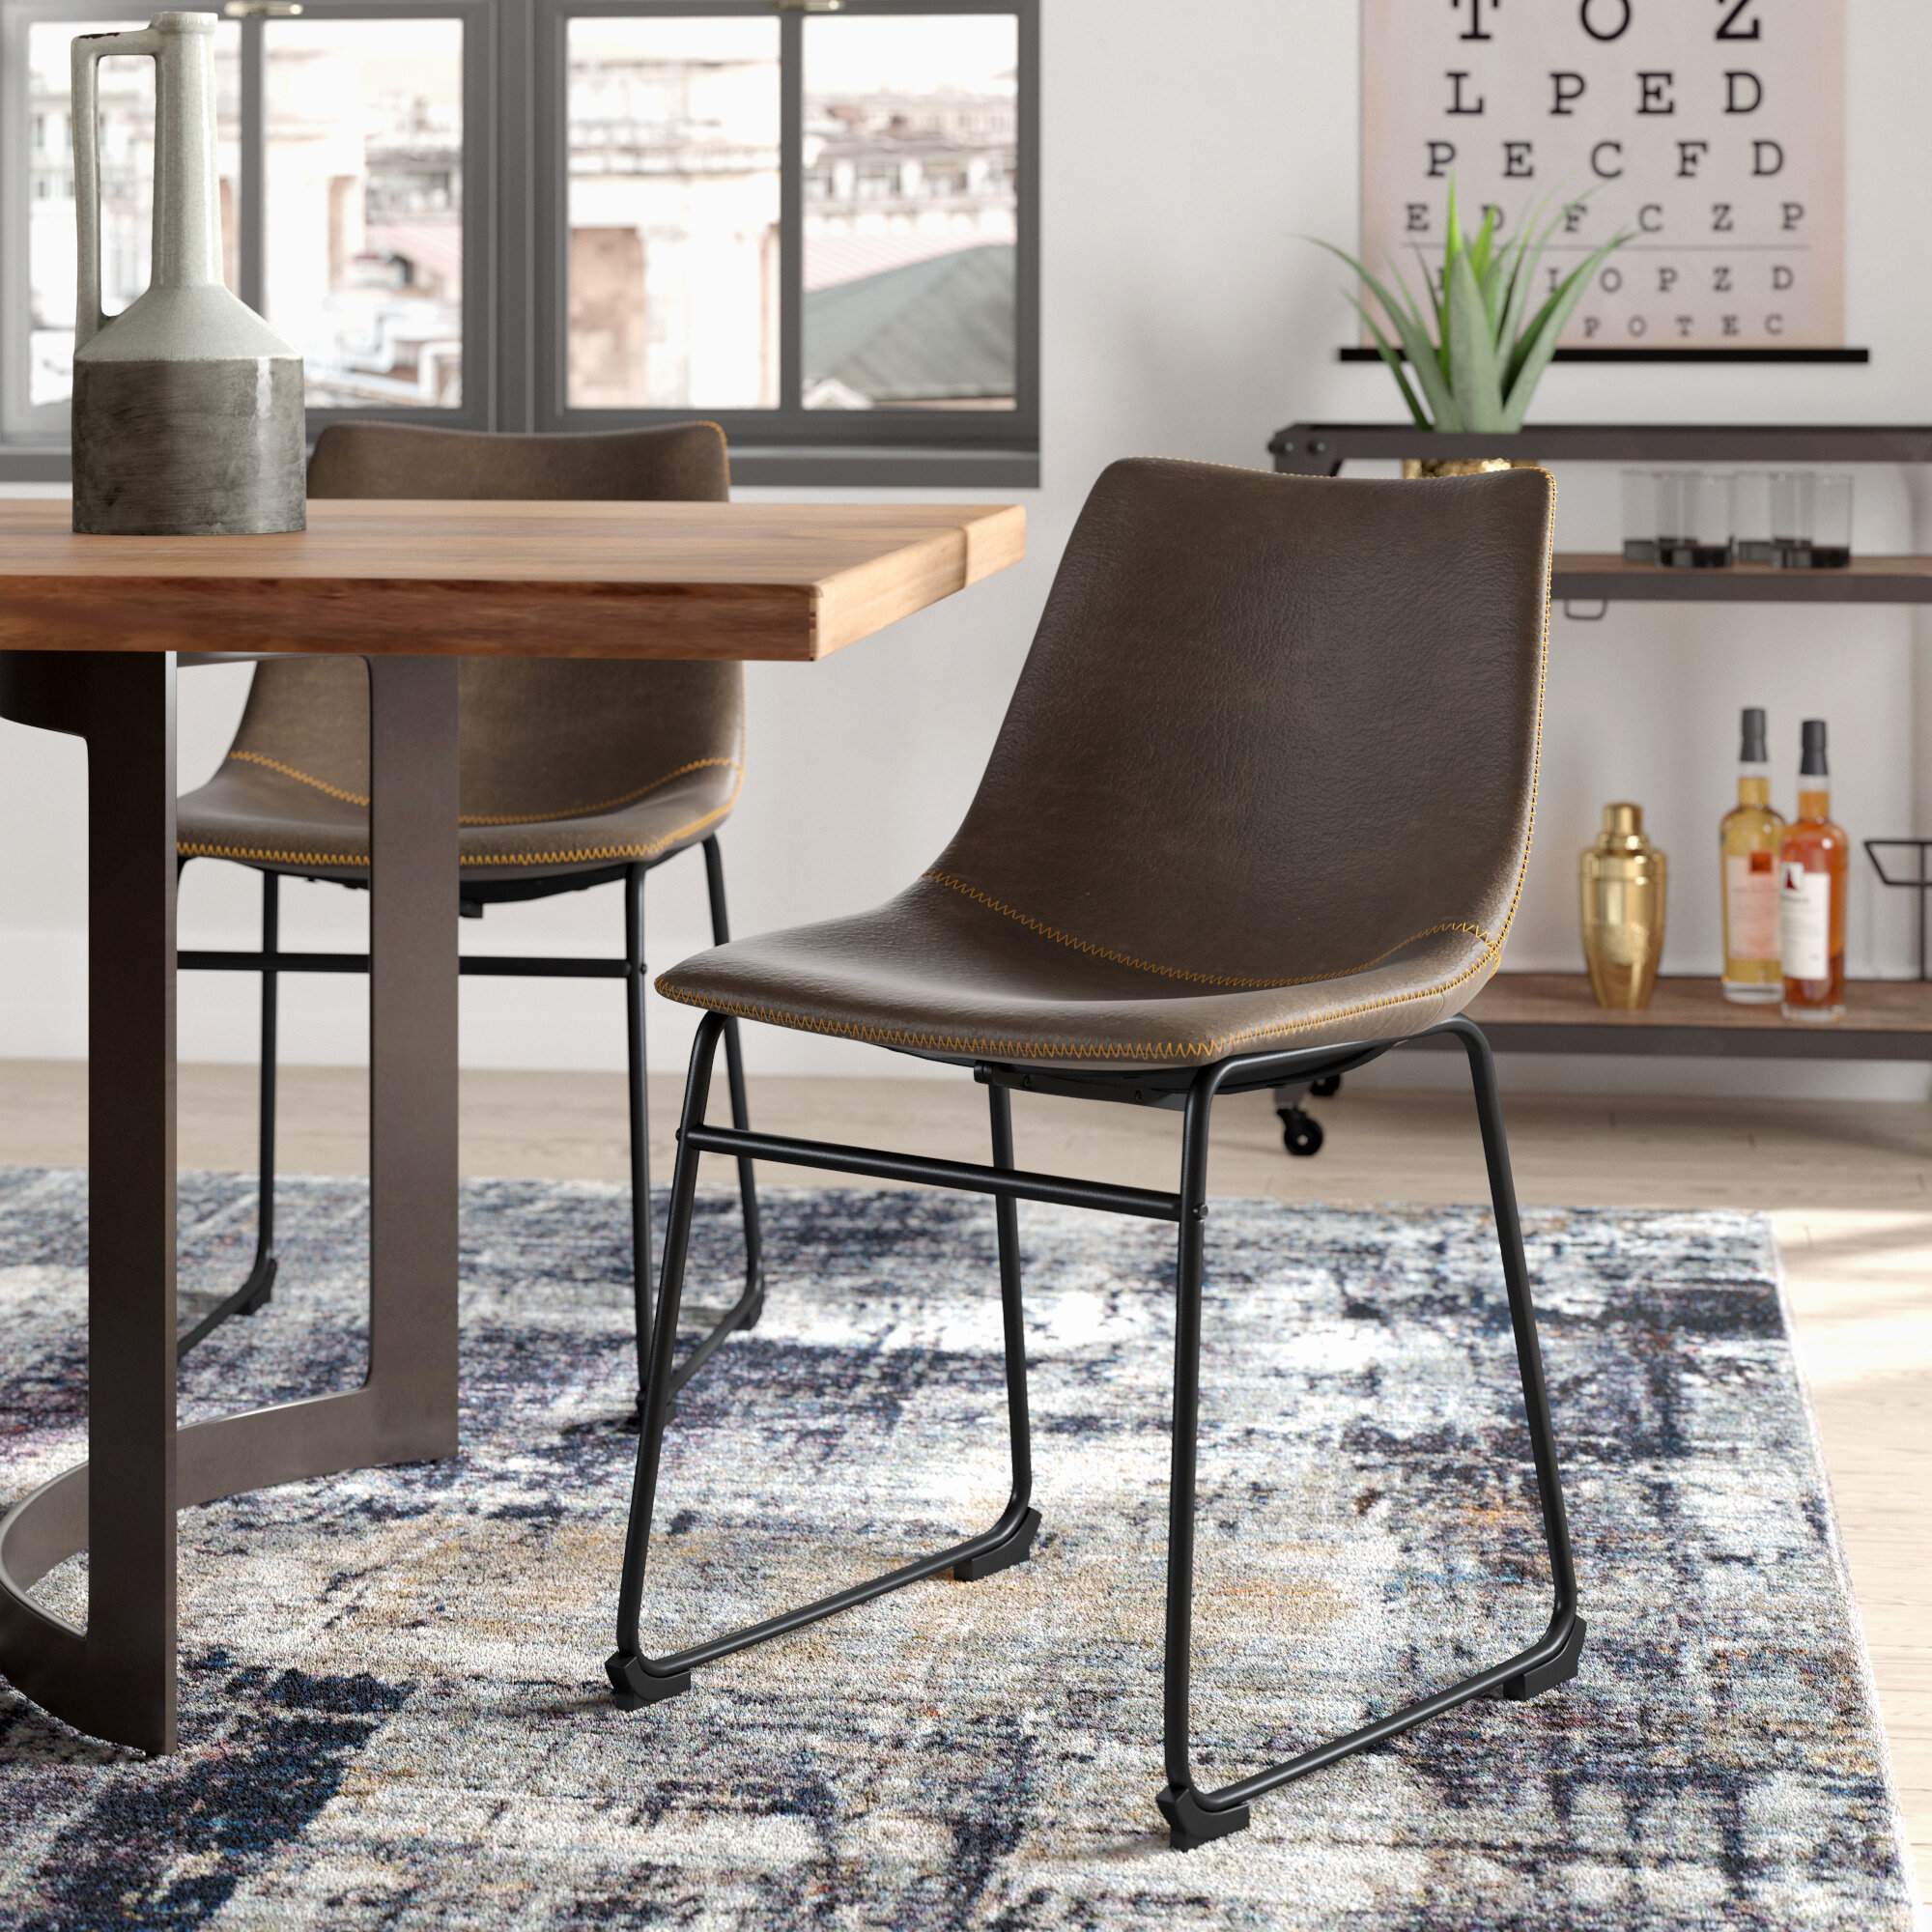 Trent austin design bamey upholstered chair reviews wayfair